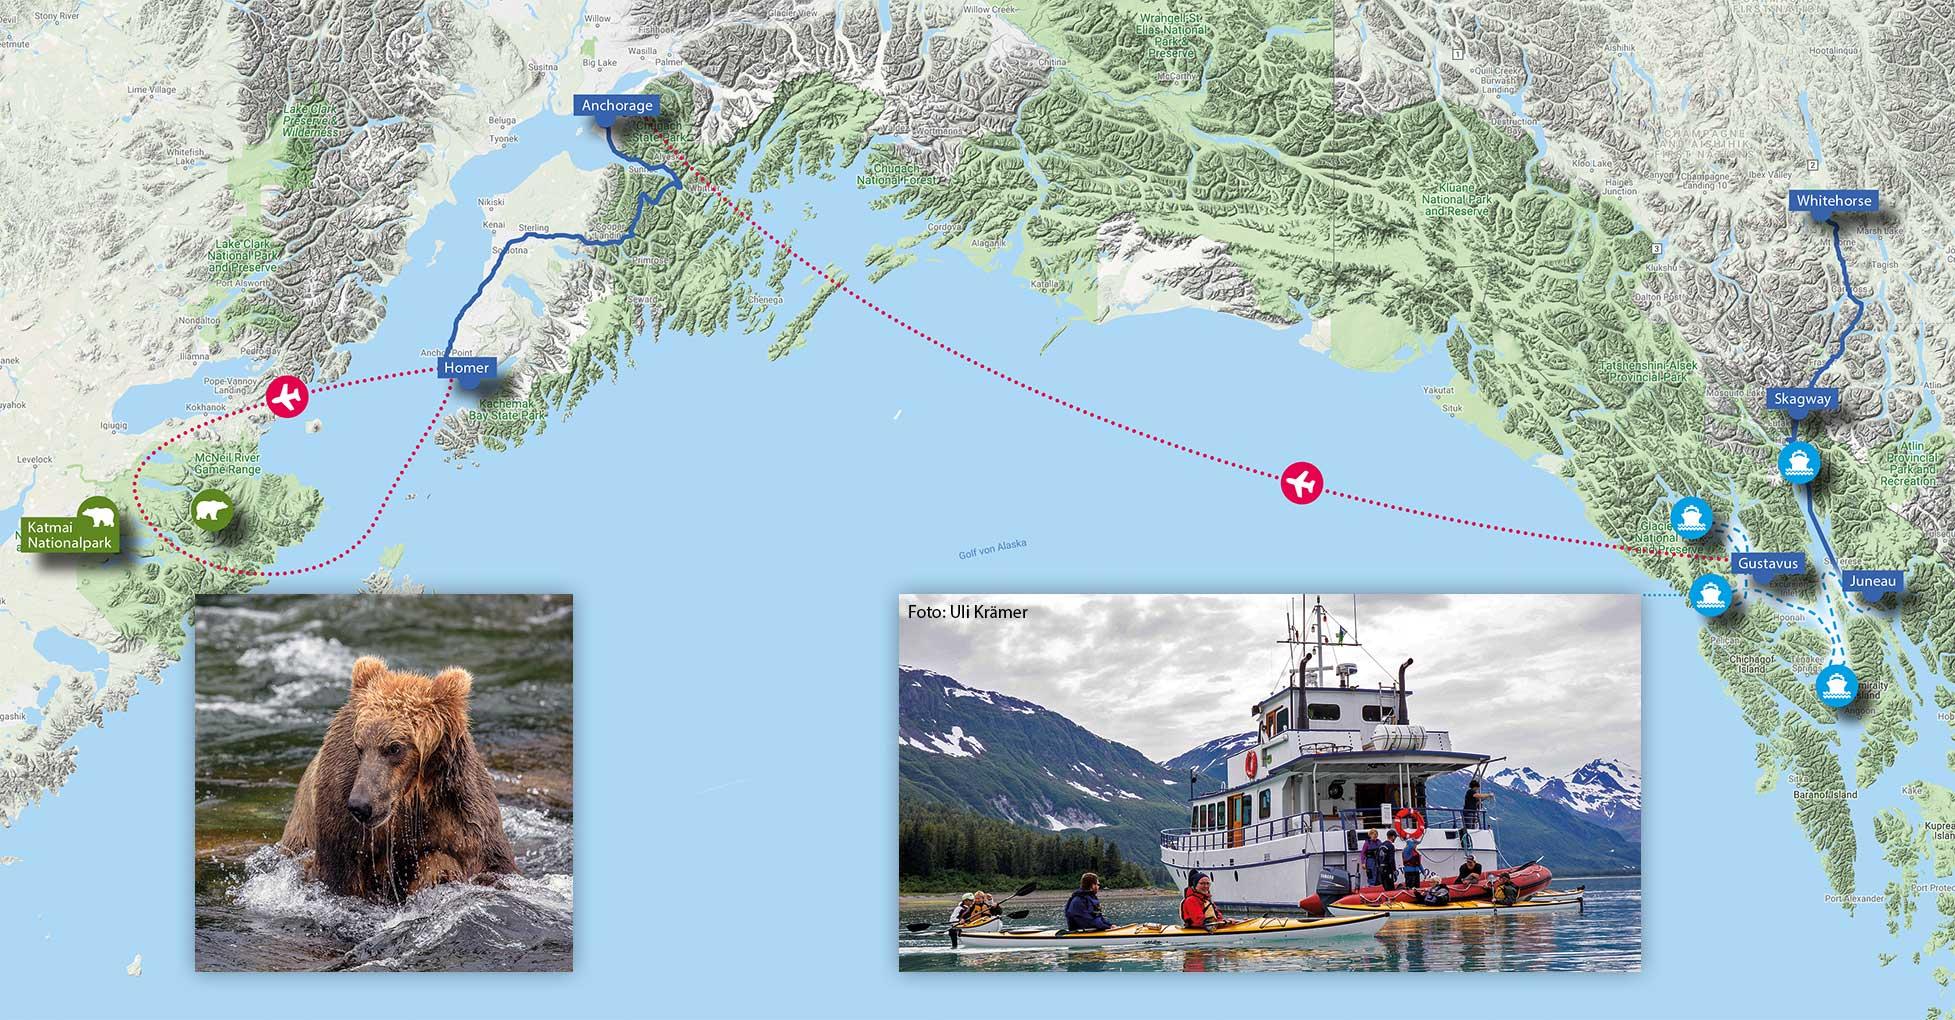 CAPTAINS'S CHOICE - Alaska, Grizzlys and Whales